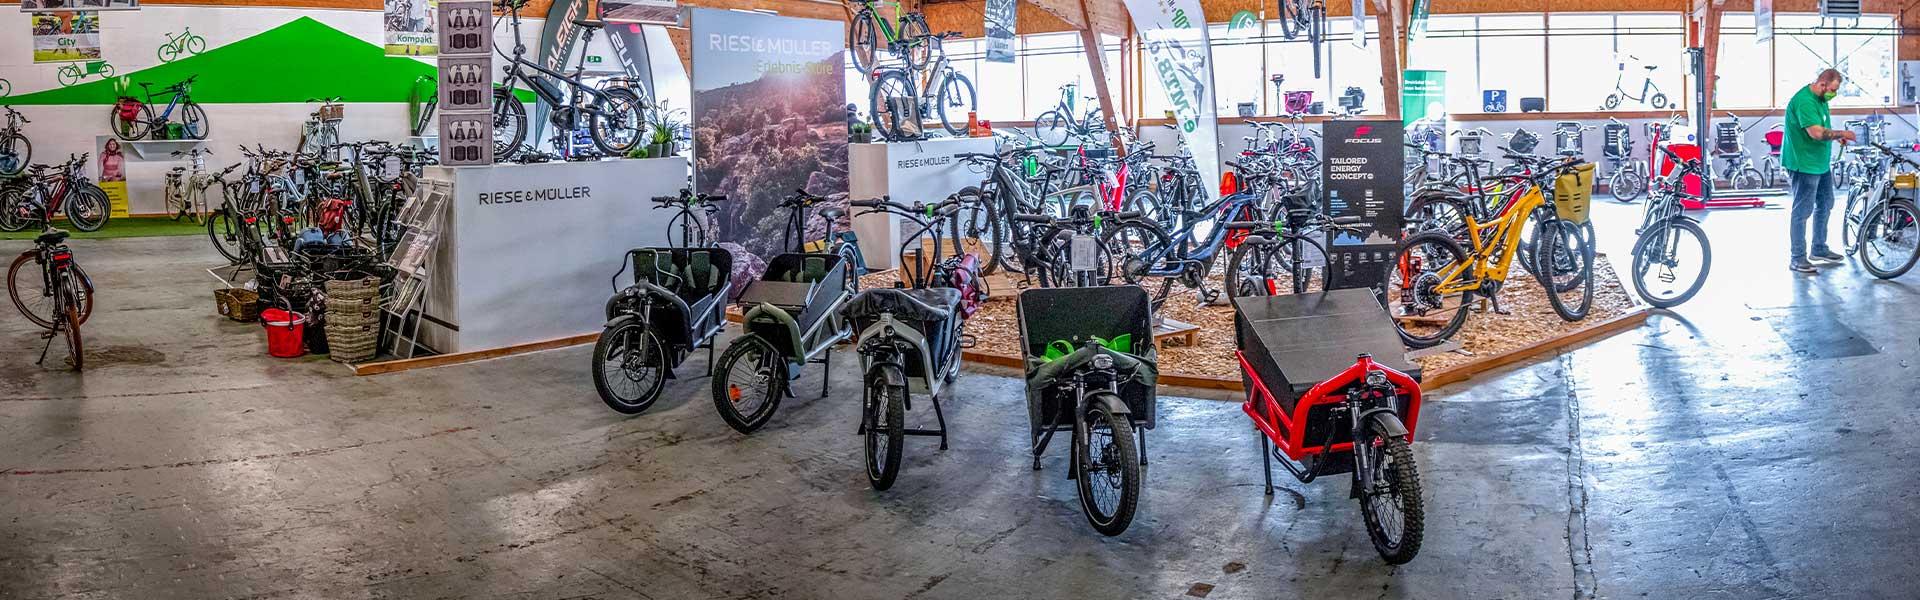 Der Shop der e-motion e-Bike Welt Ahrensburg